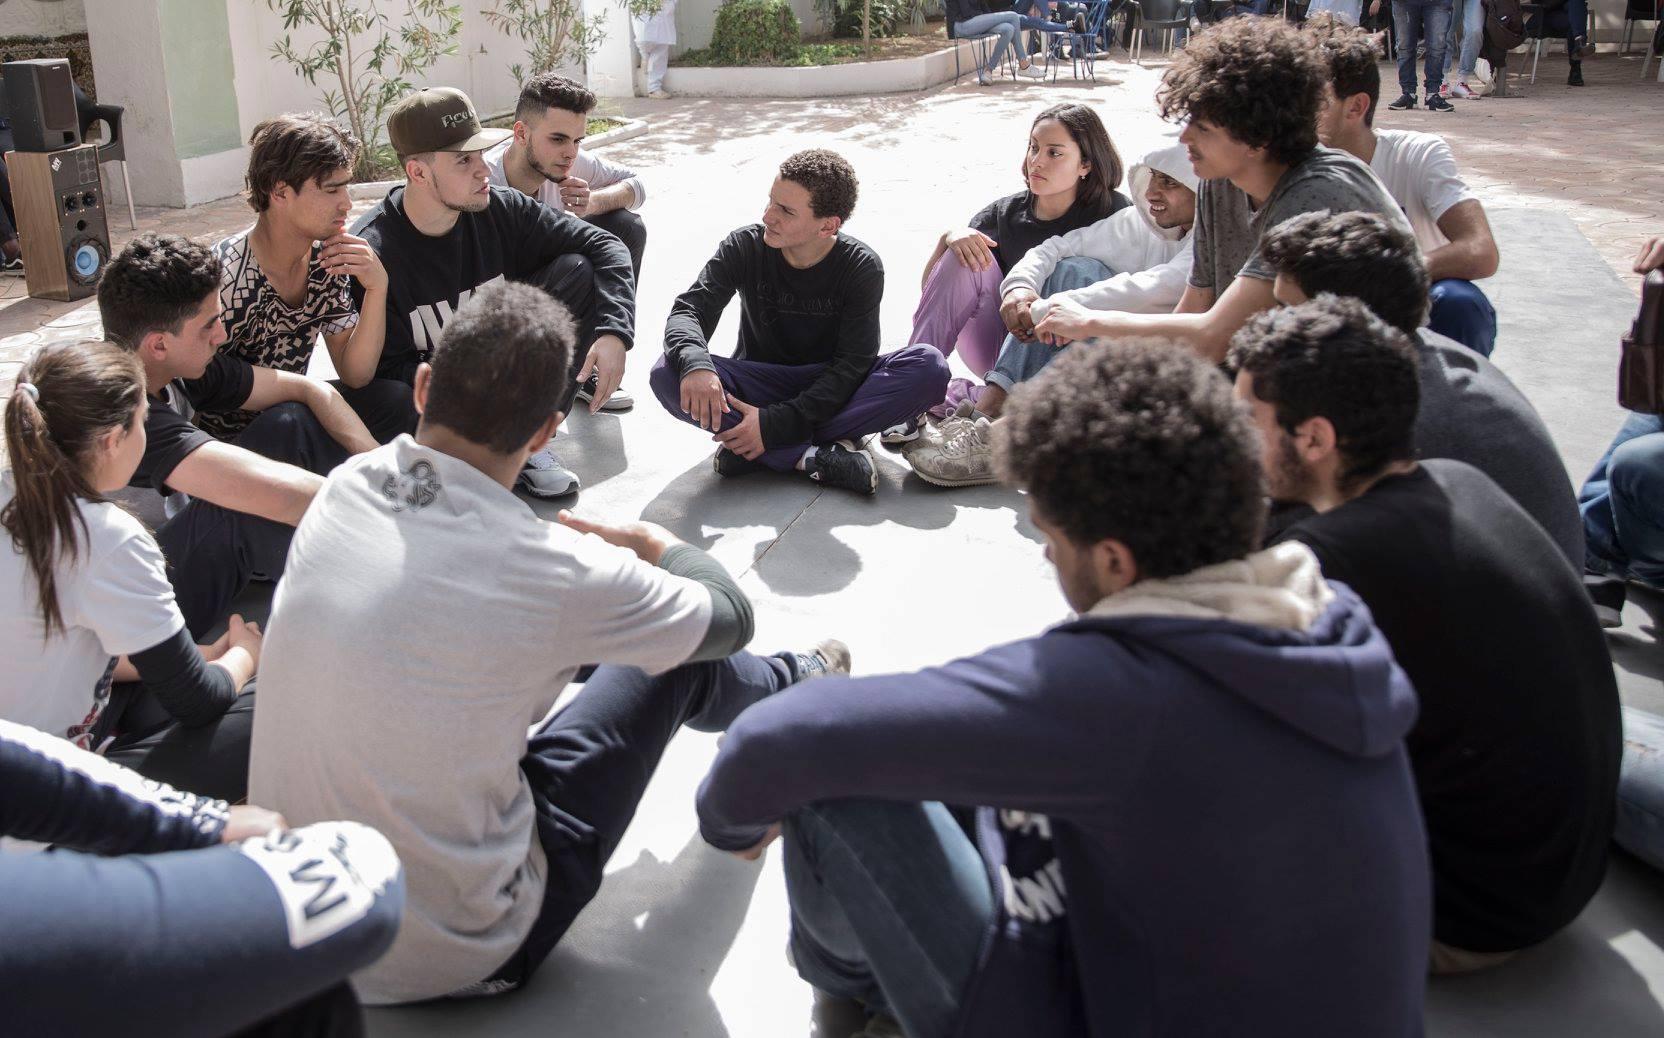 Bboy Diehard's advice to the new generation of Bboys in Tunisia